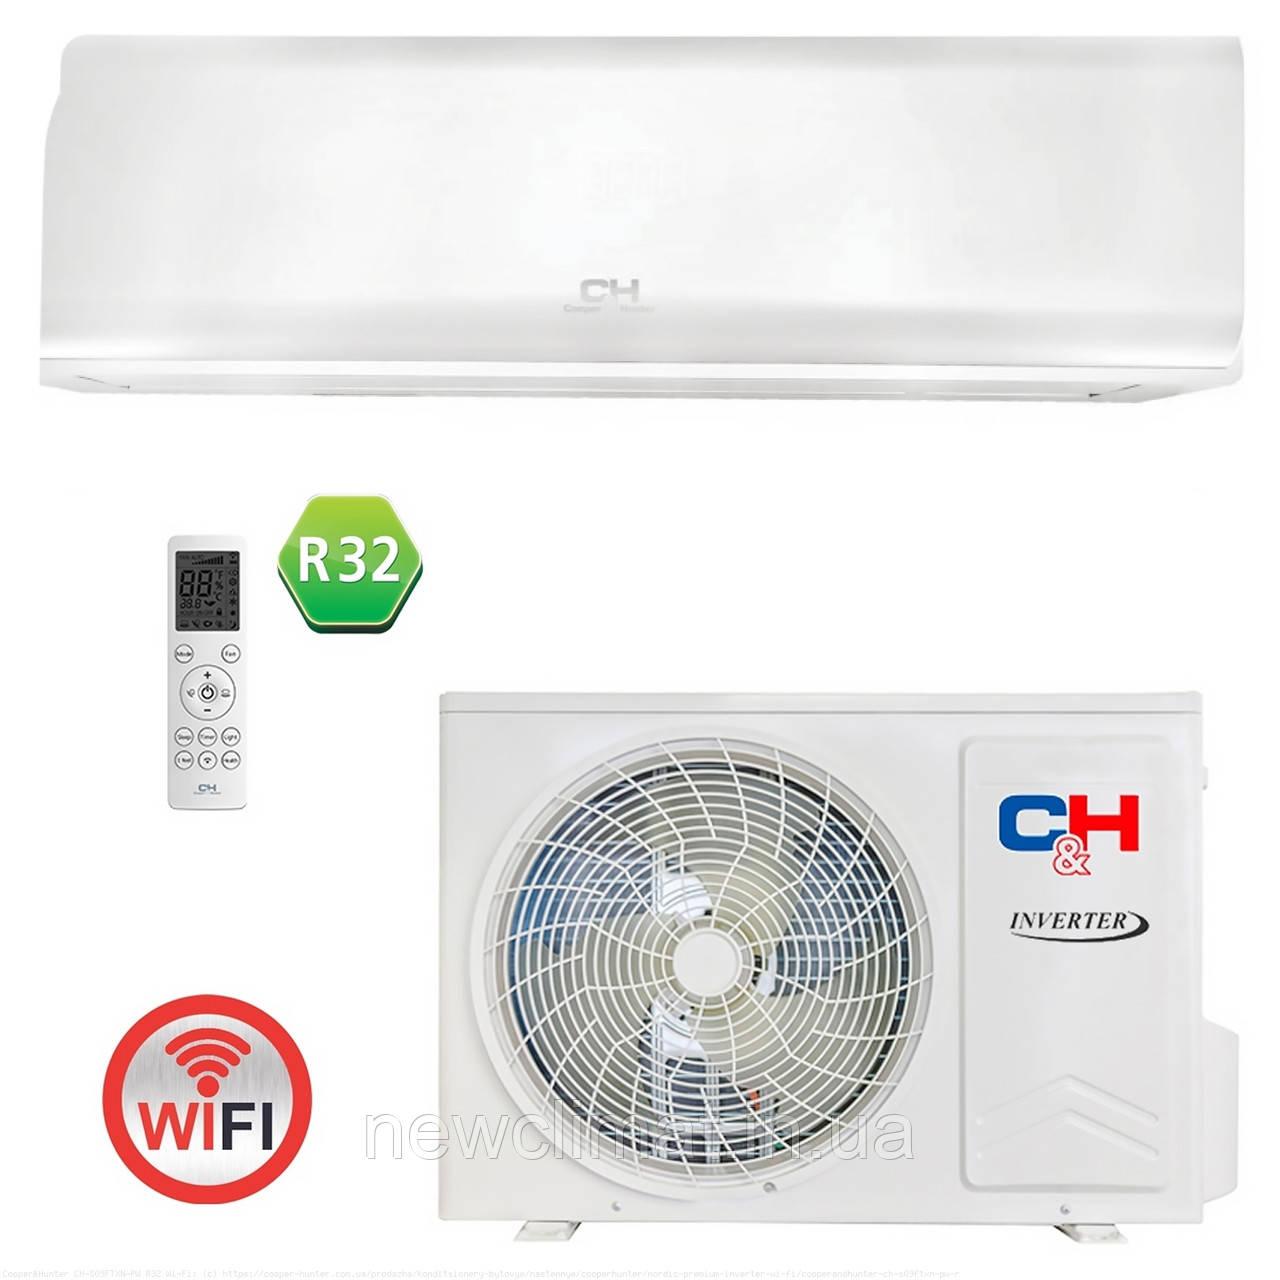 CH-S24FTXN-PW R32 Wi-Fi